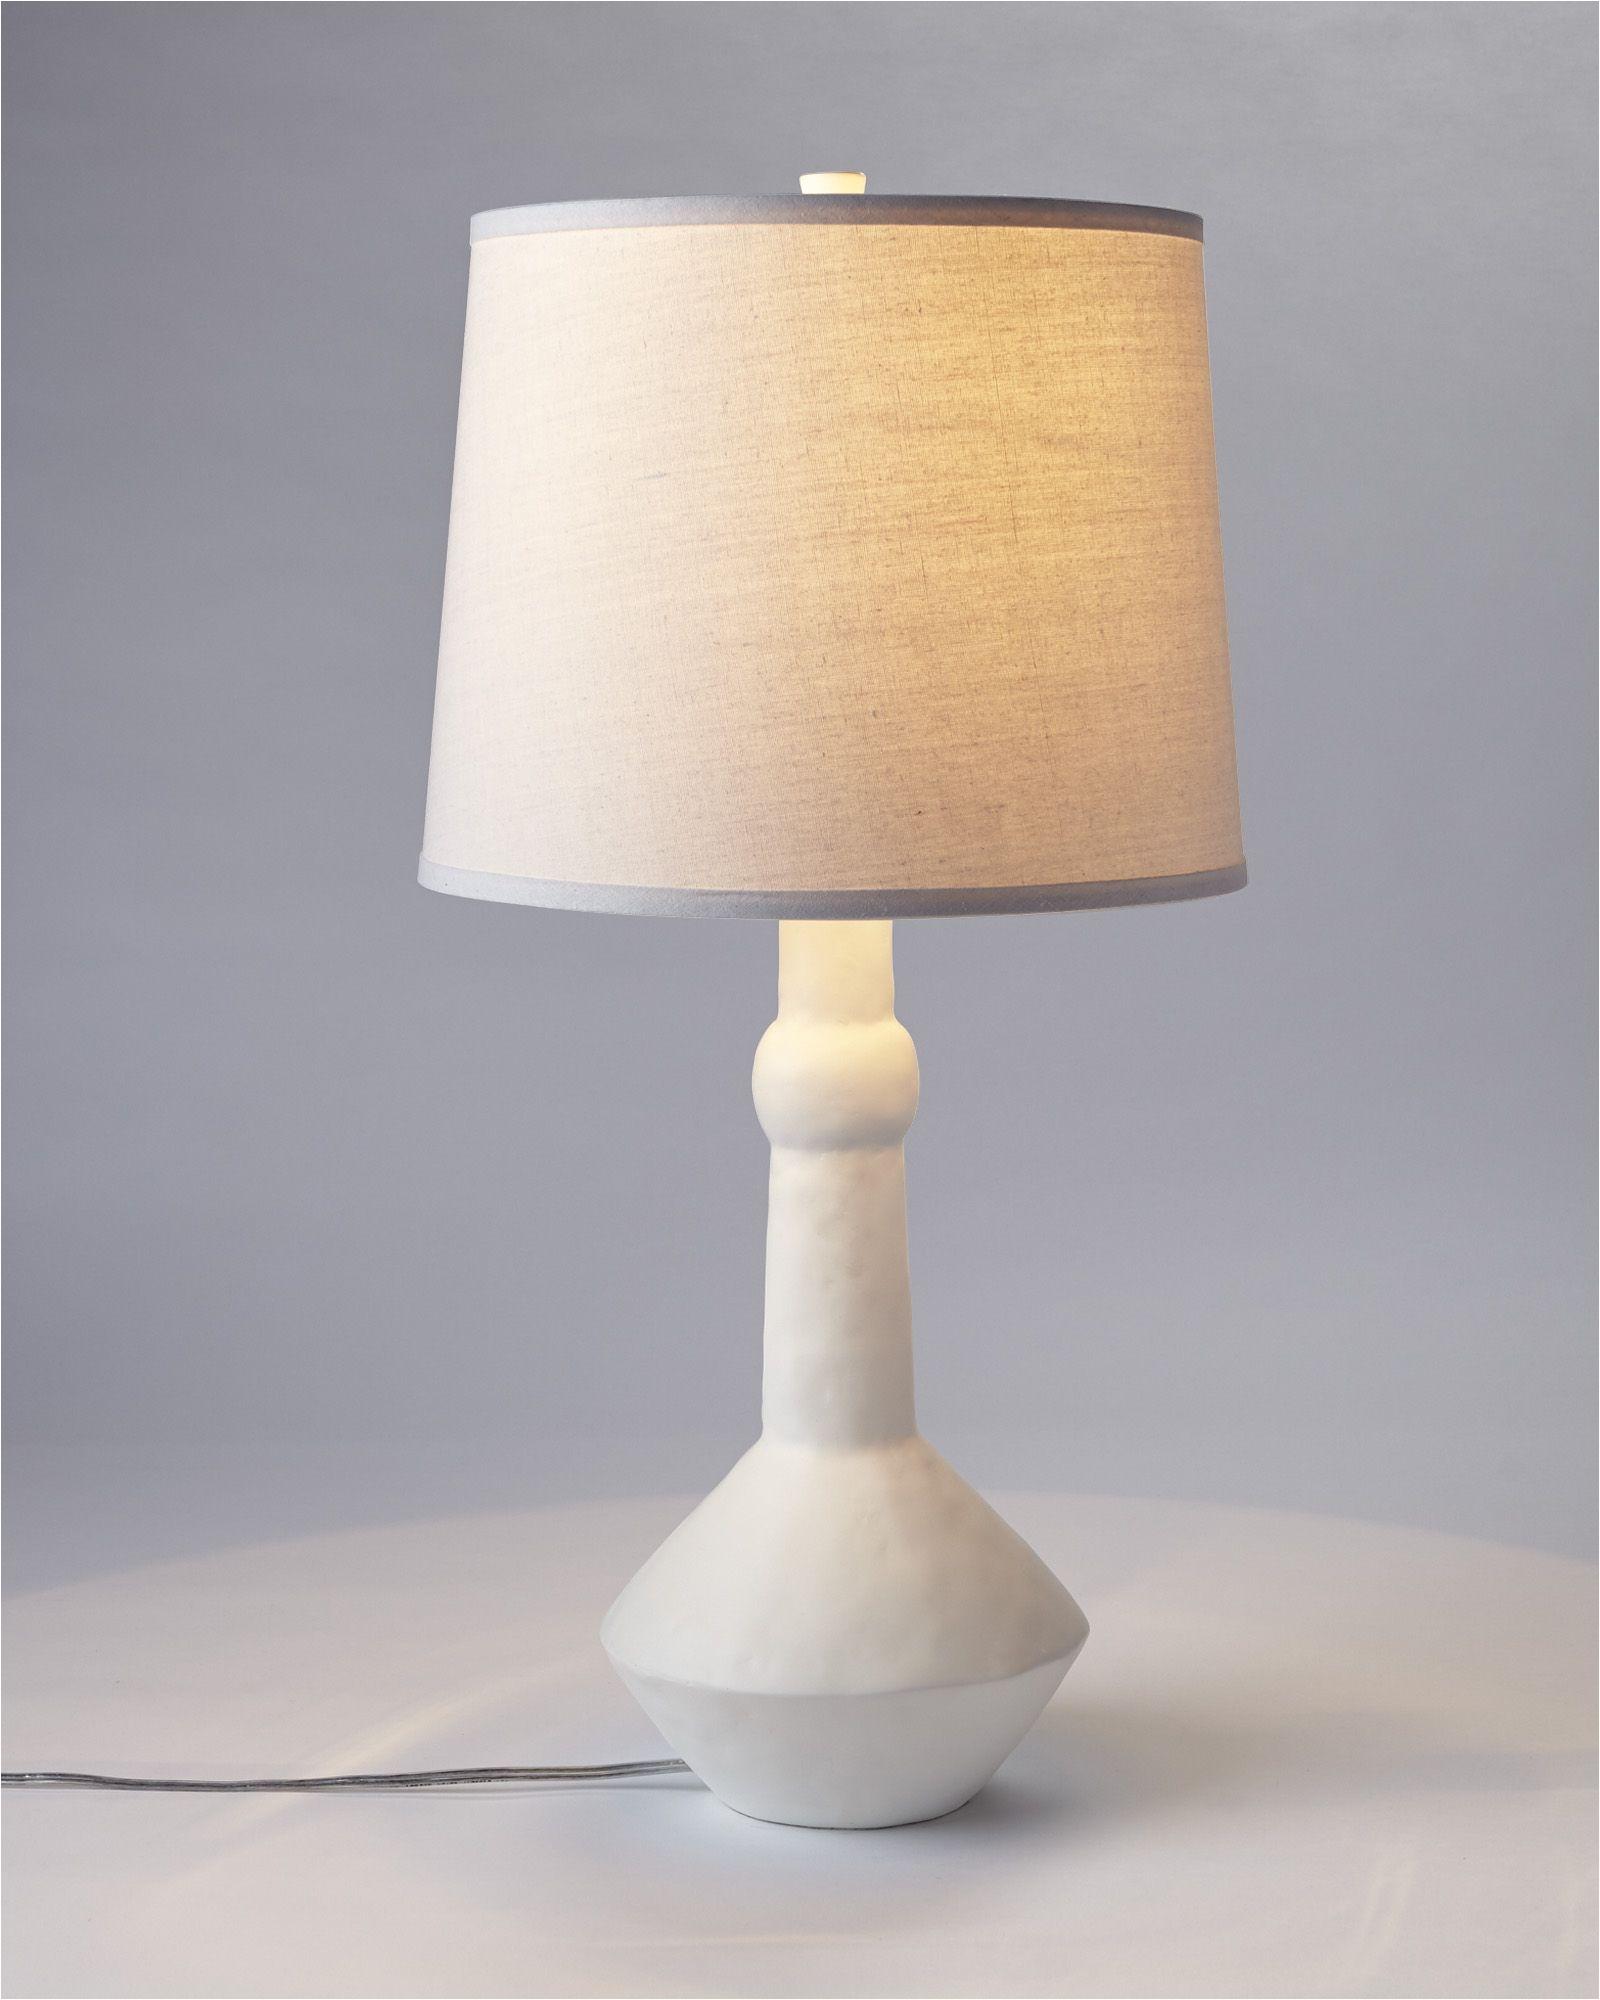 brighton table lamp largebrighton table lamp large